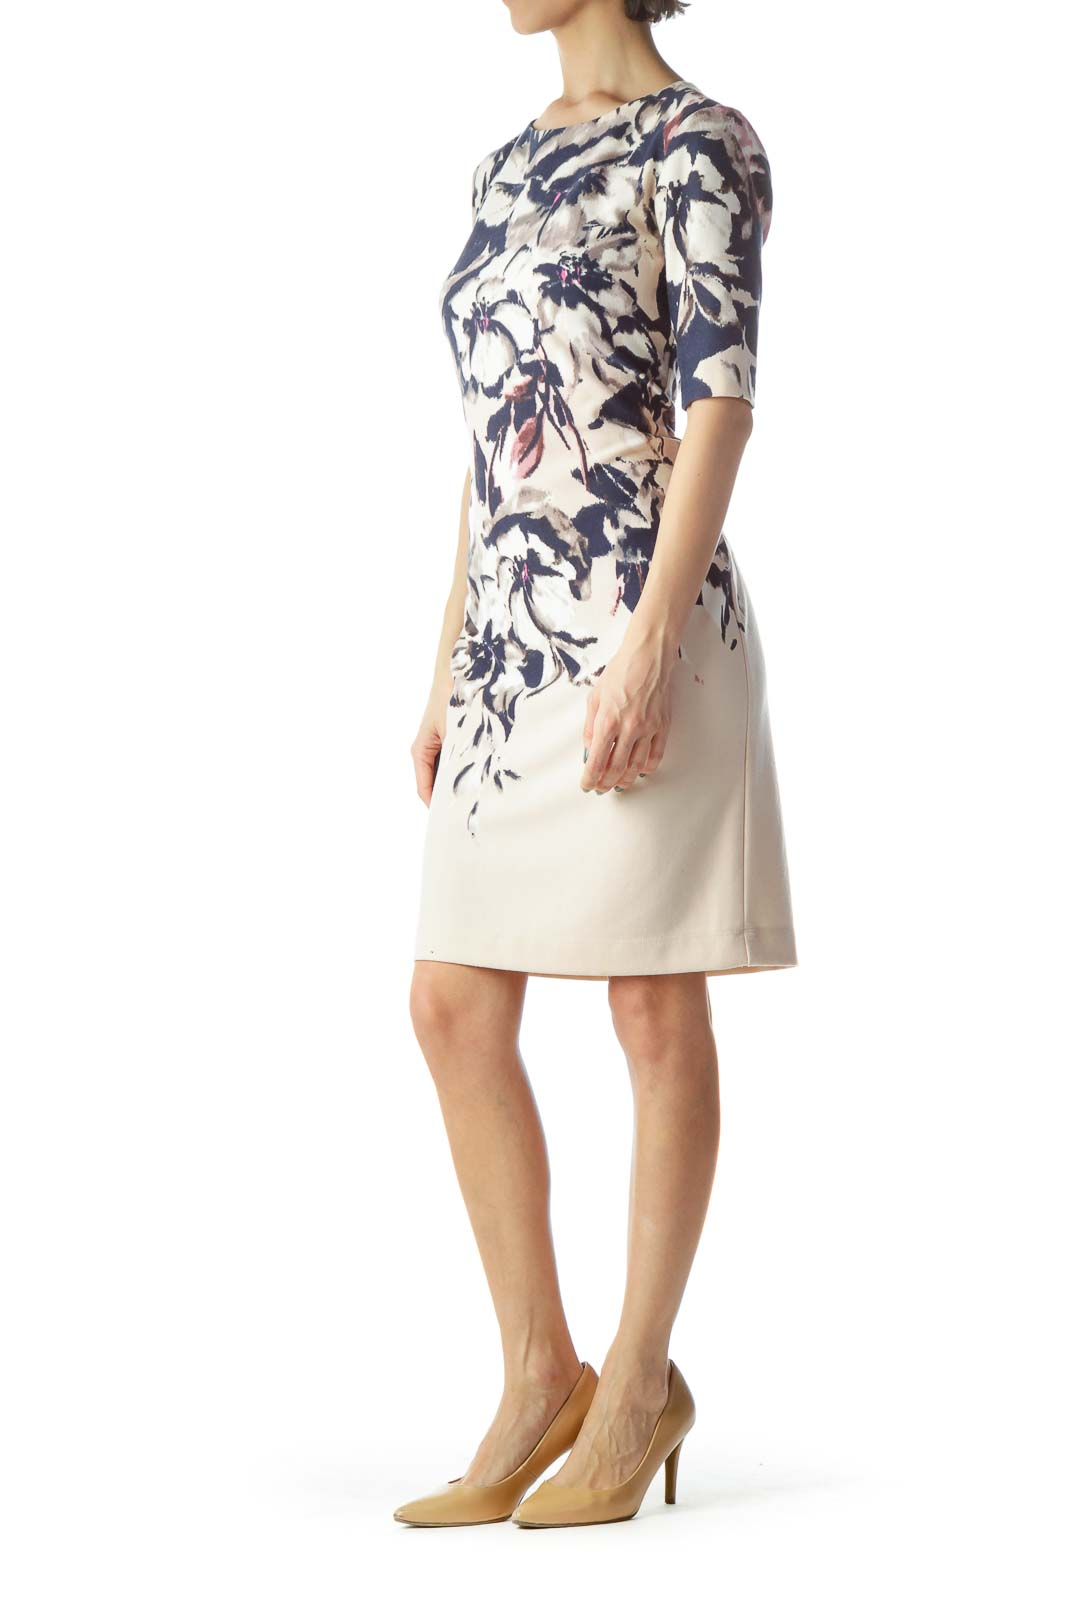 Light Pink Navy Blue Floral Print Dress